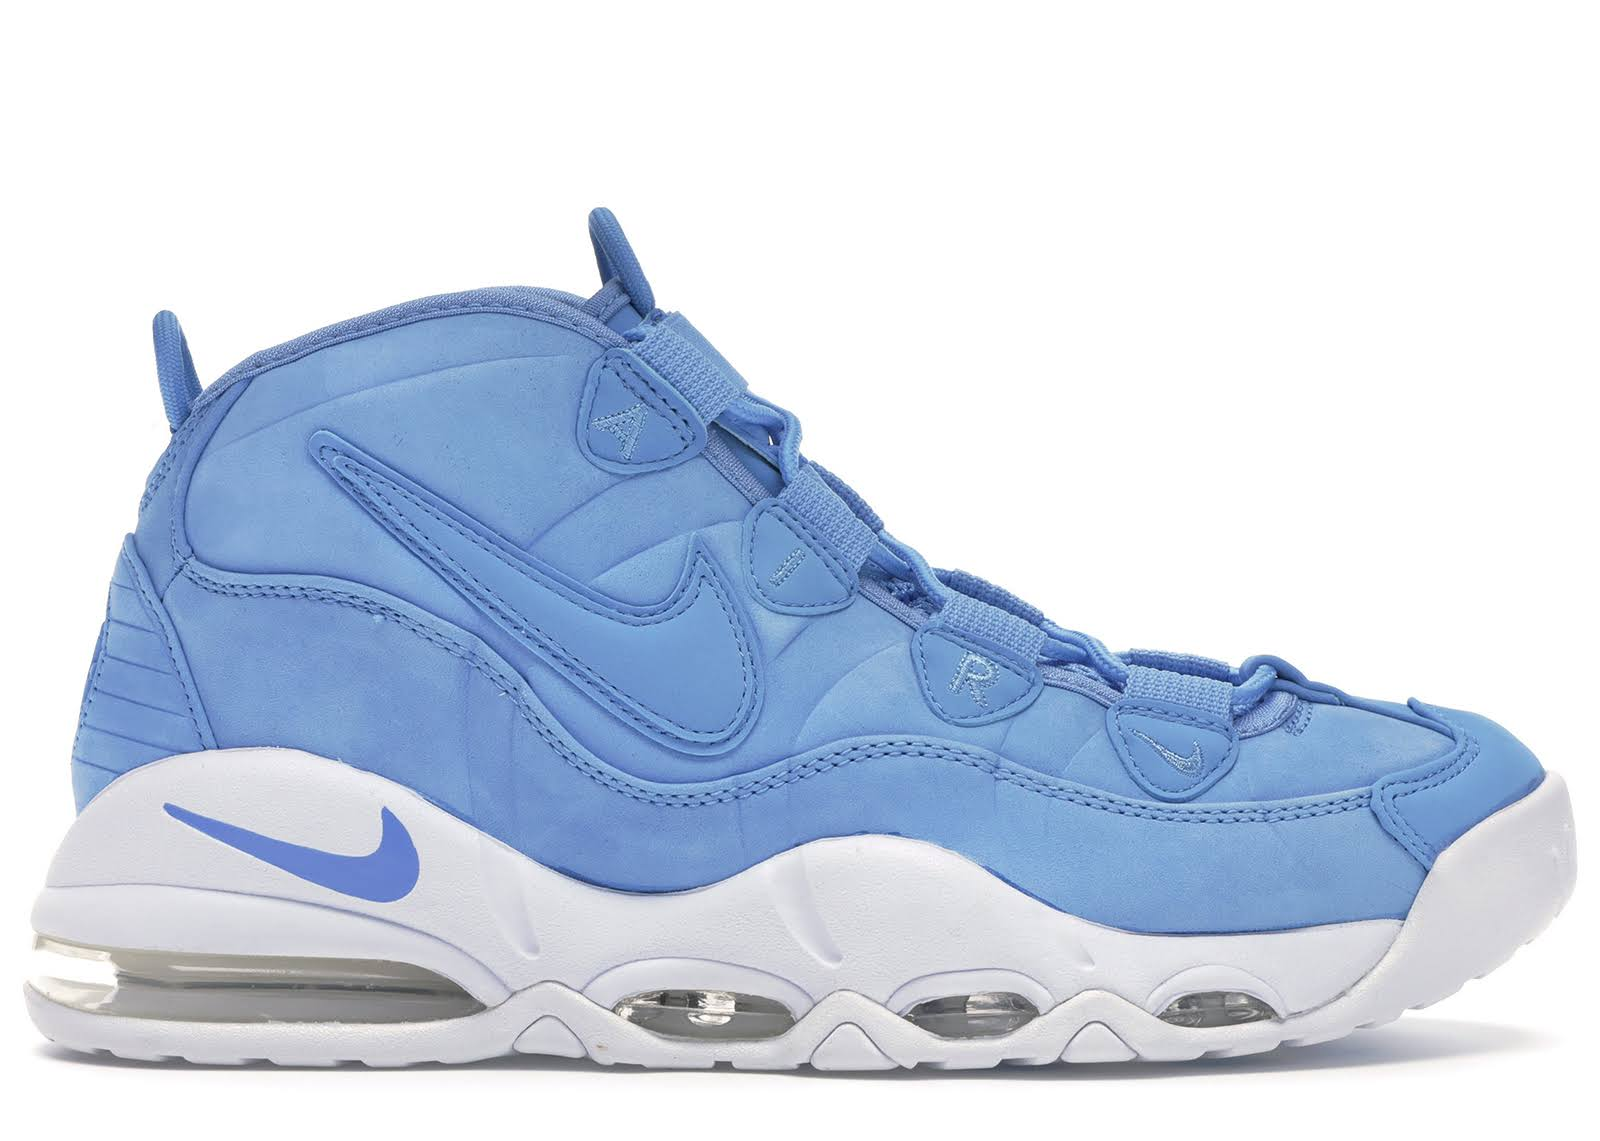 Nike Air Max Uptempo 95 University Blue  n7Nh17v